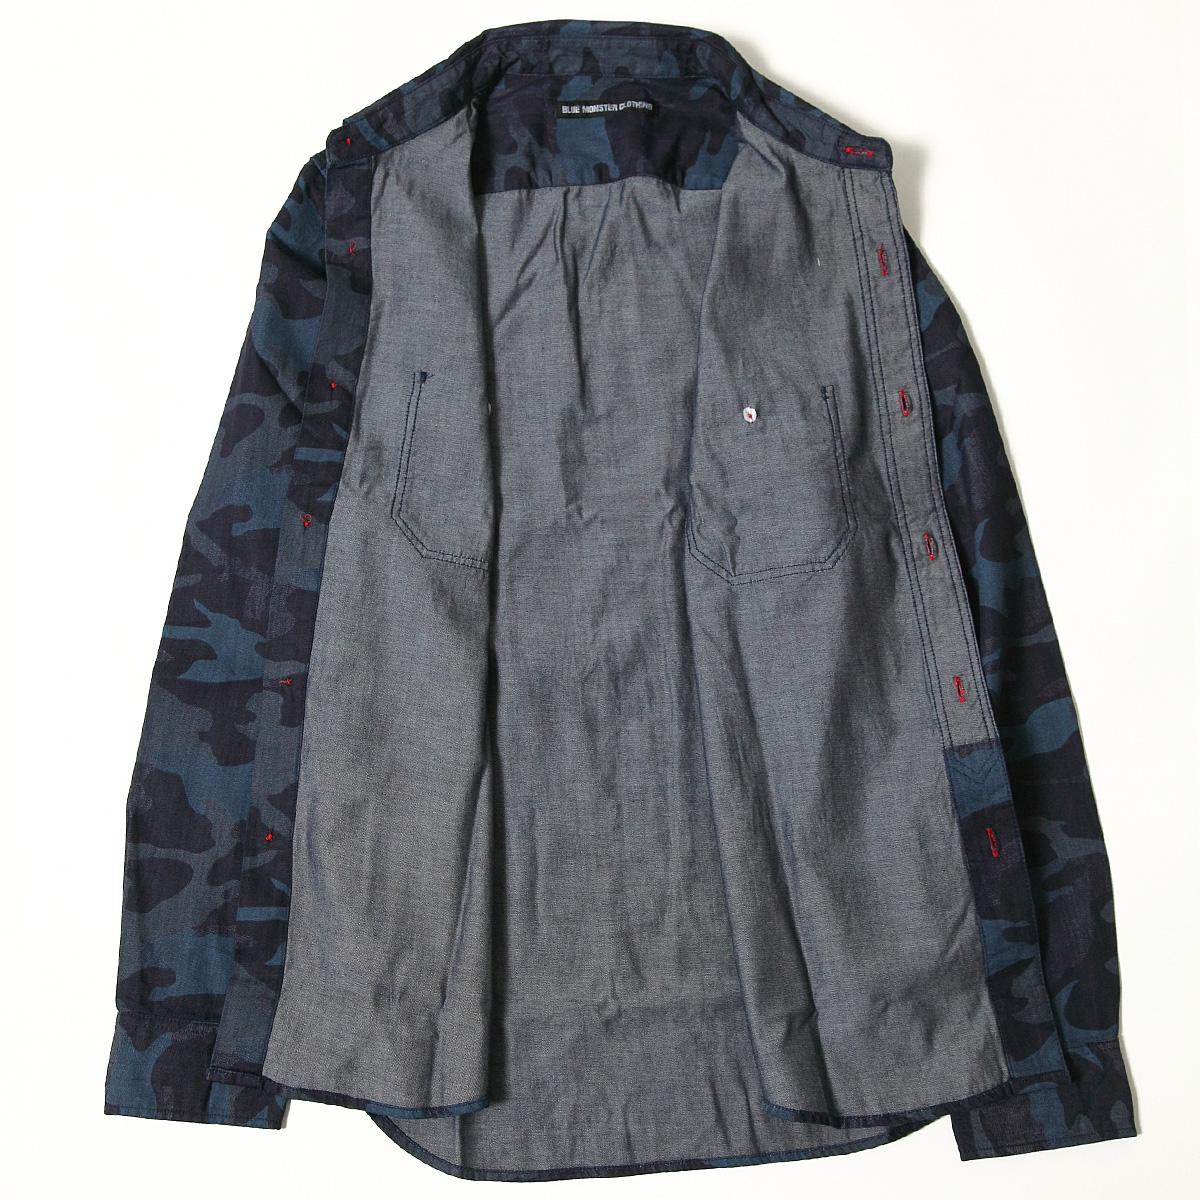 BMC 맨즈 밀리터리 셔츠 긴소매 위장무늬 원 워쉬/다크브르카모무늬 셔츠 미채 위장 셔츠 위장 BLUE MONSTER JEANS 브르몬스타크로징비엠시브릿트워크스 BMST01